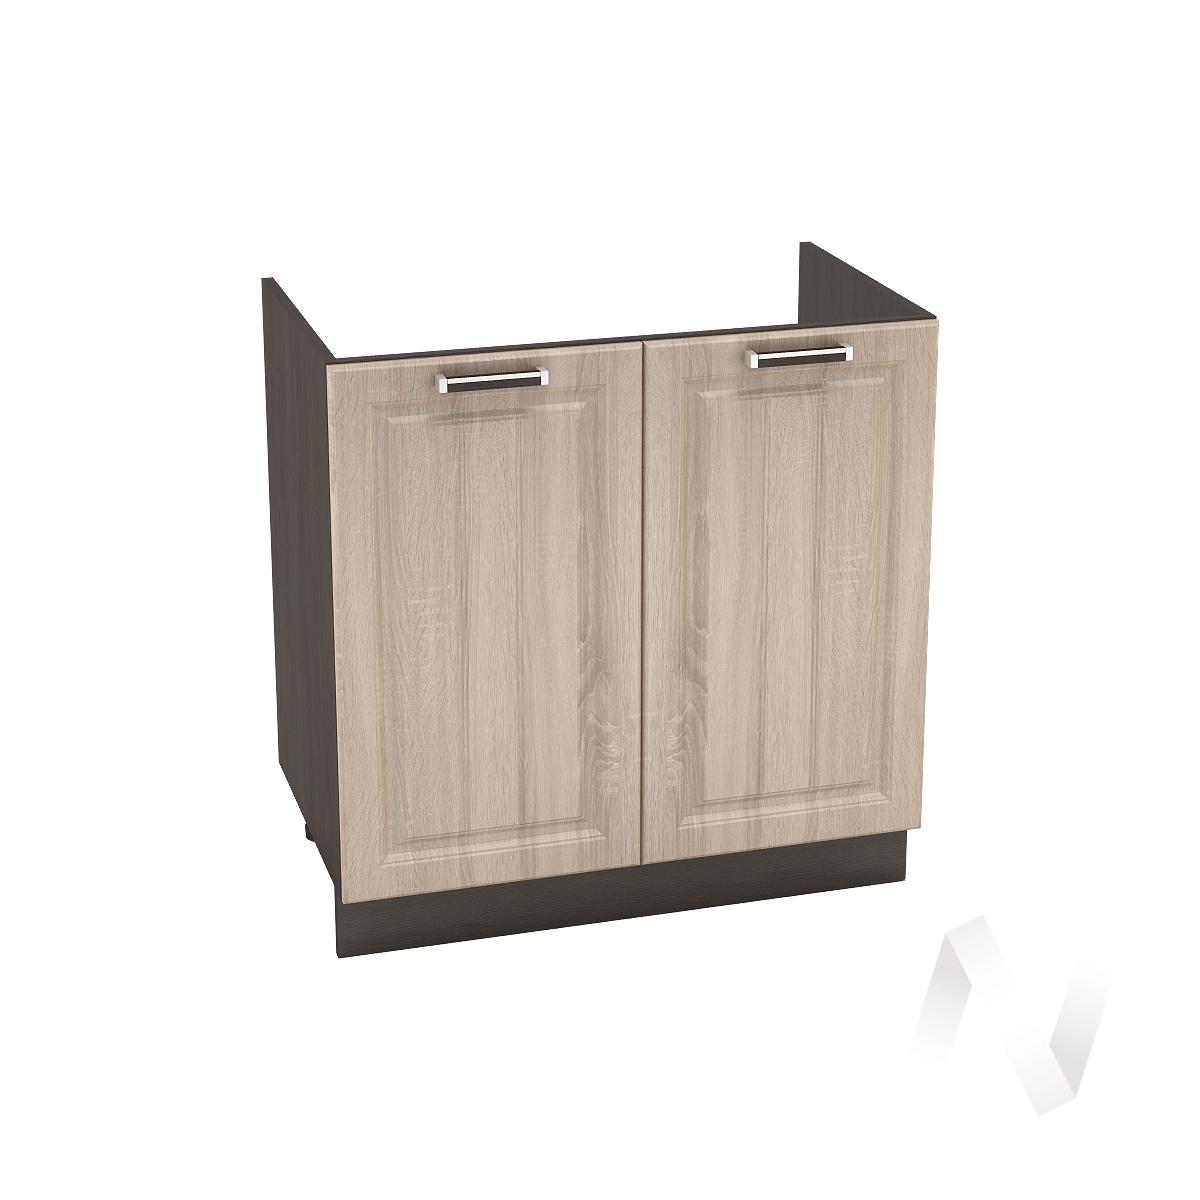 "Кухня ""Прага"": Шкаф нижний под мойку 800, ШНМ 800 новый (дуб сонома/корпус венге)"